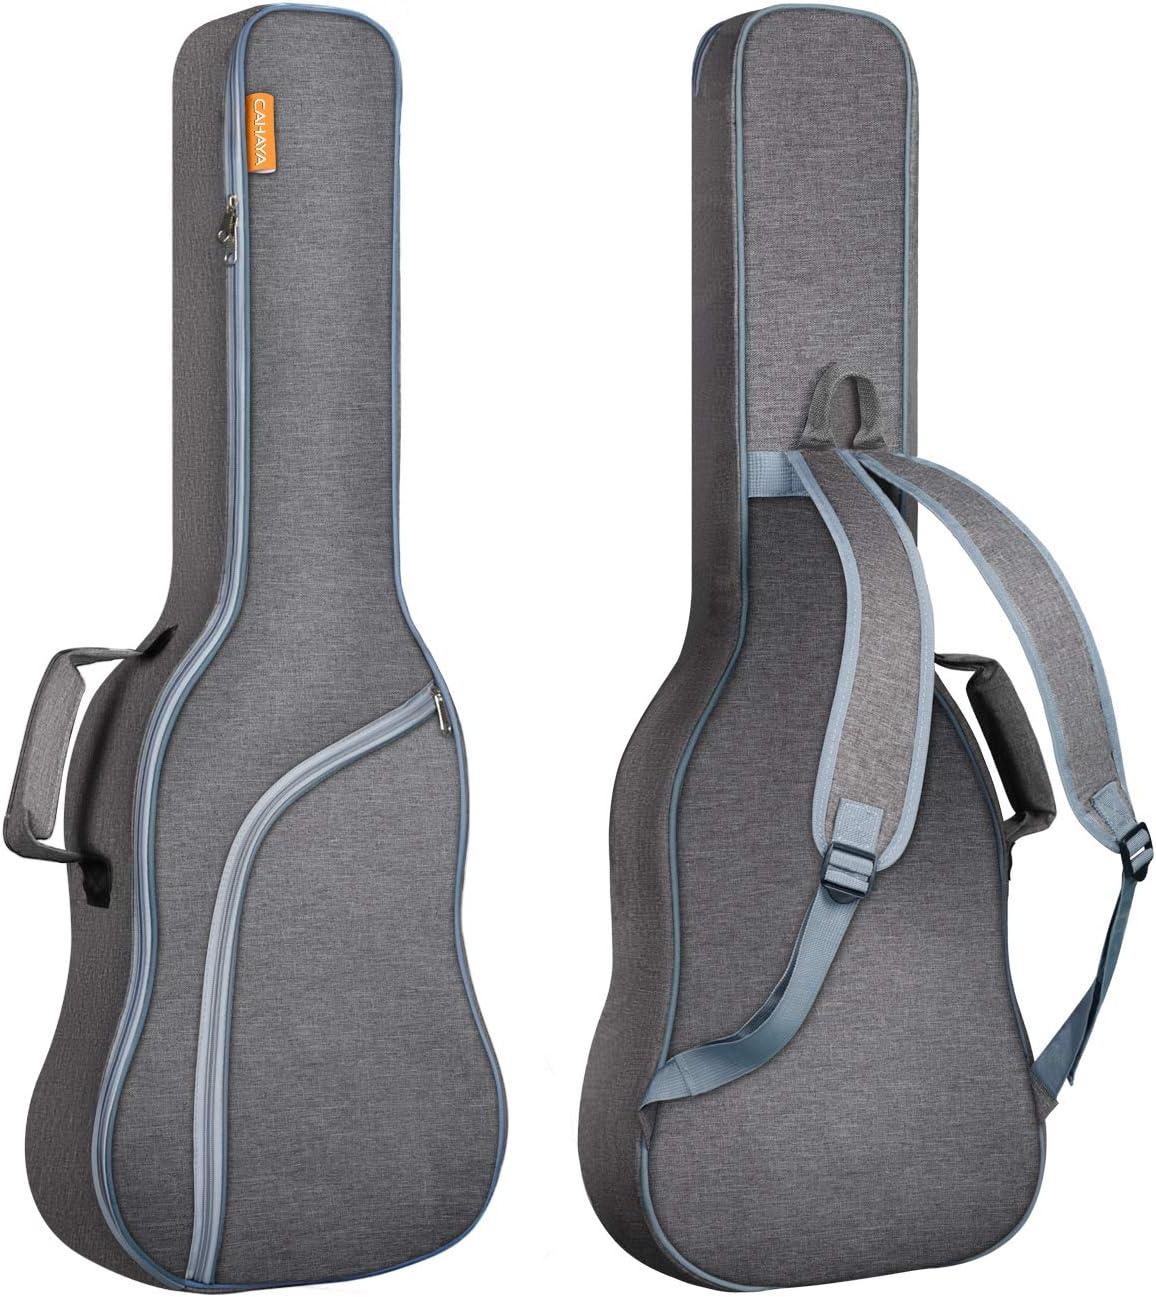 CAHAYA Bolsa Guitarra Electrica Acolchada 9mm para Guitarra Electrica con Un Bolsillo Frontal para Libros de Música